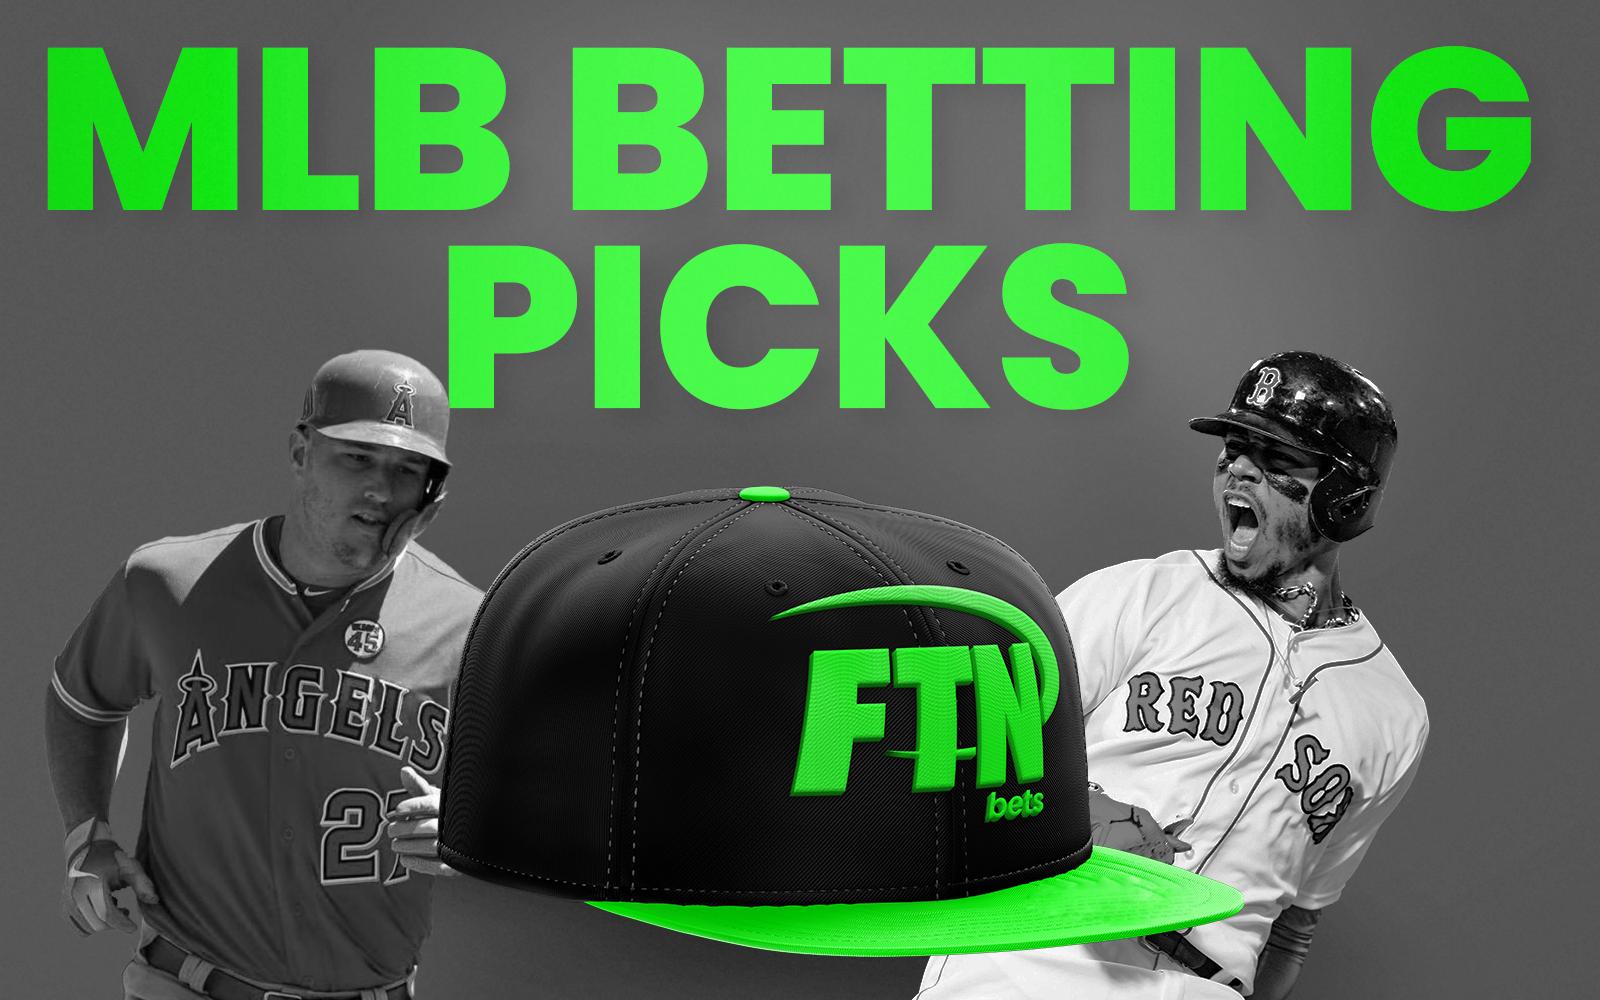 Baseball betting tools online soccer betting secrets capri